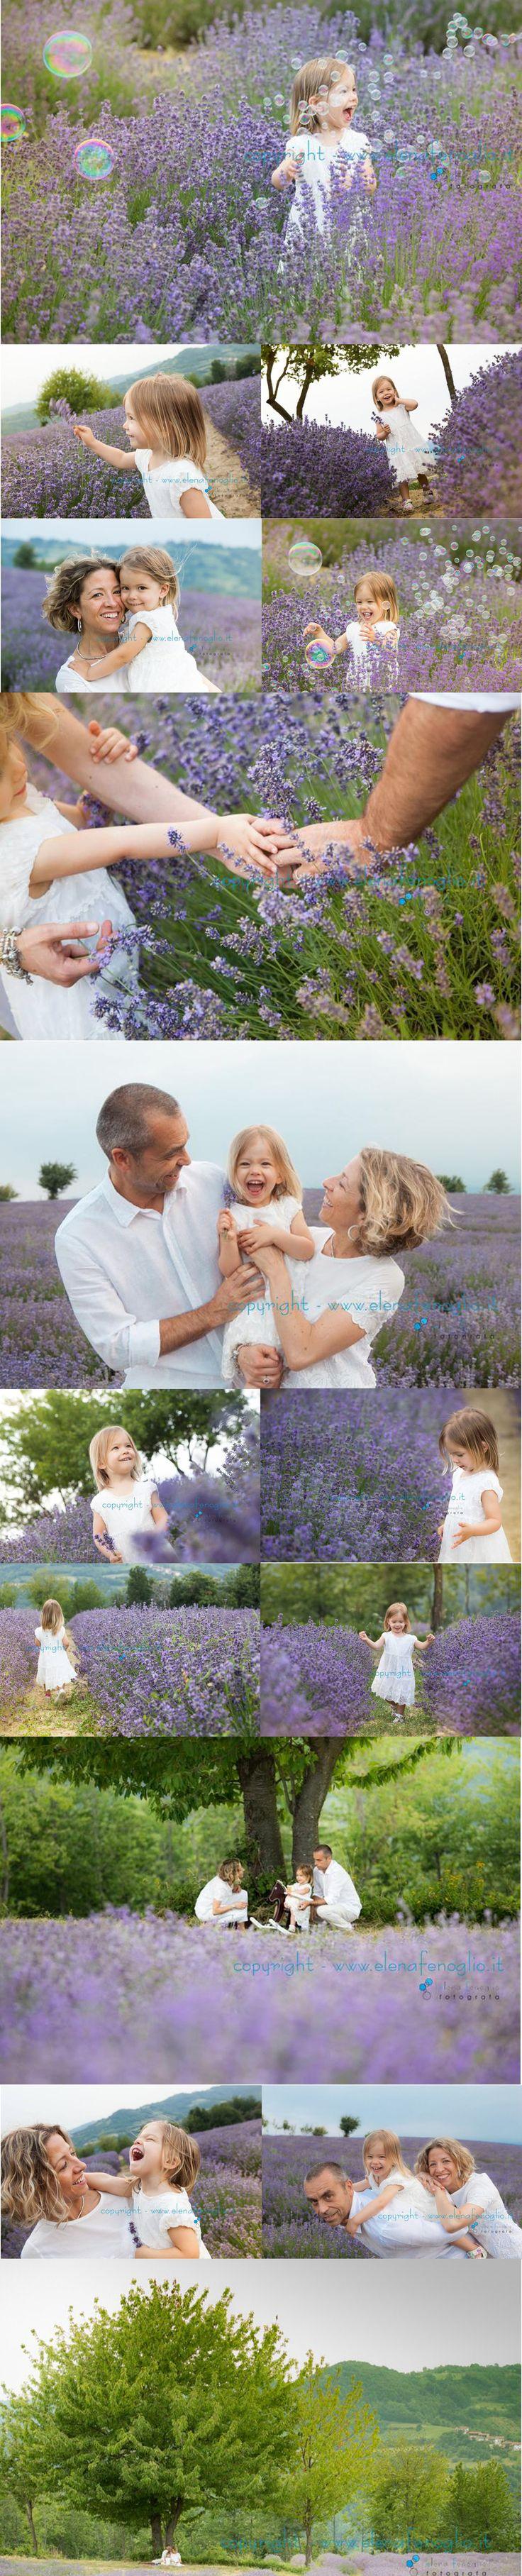 #family #mom #dad #love